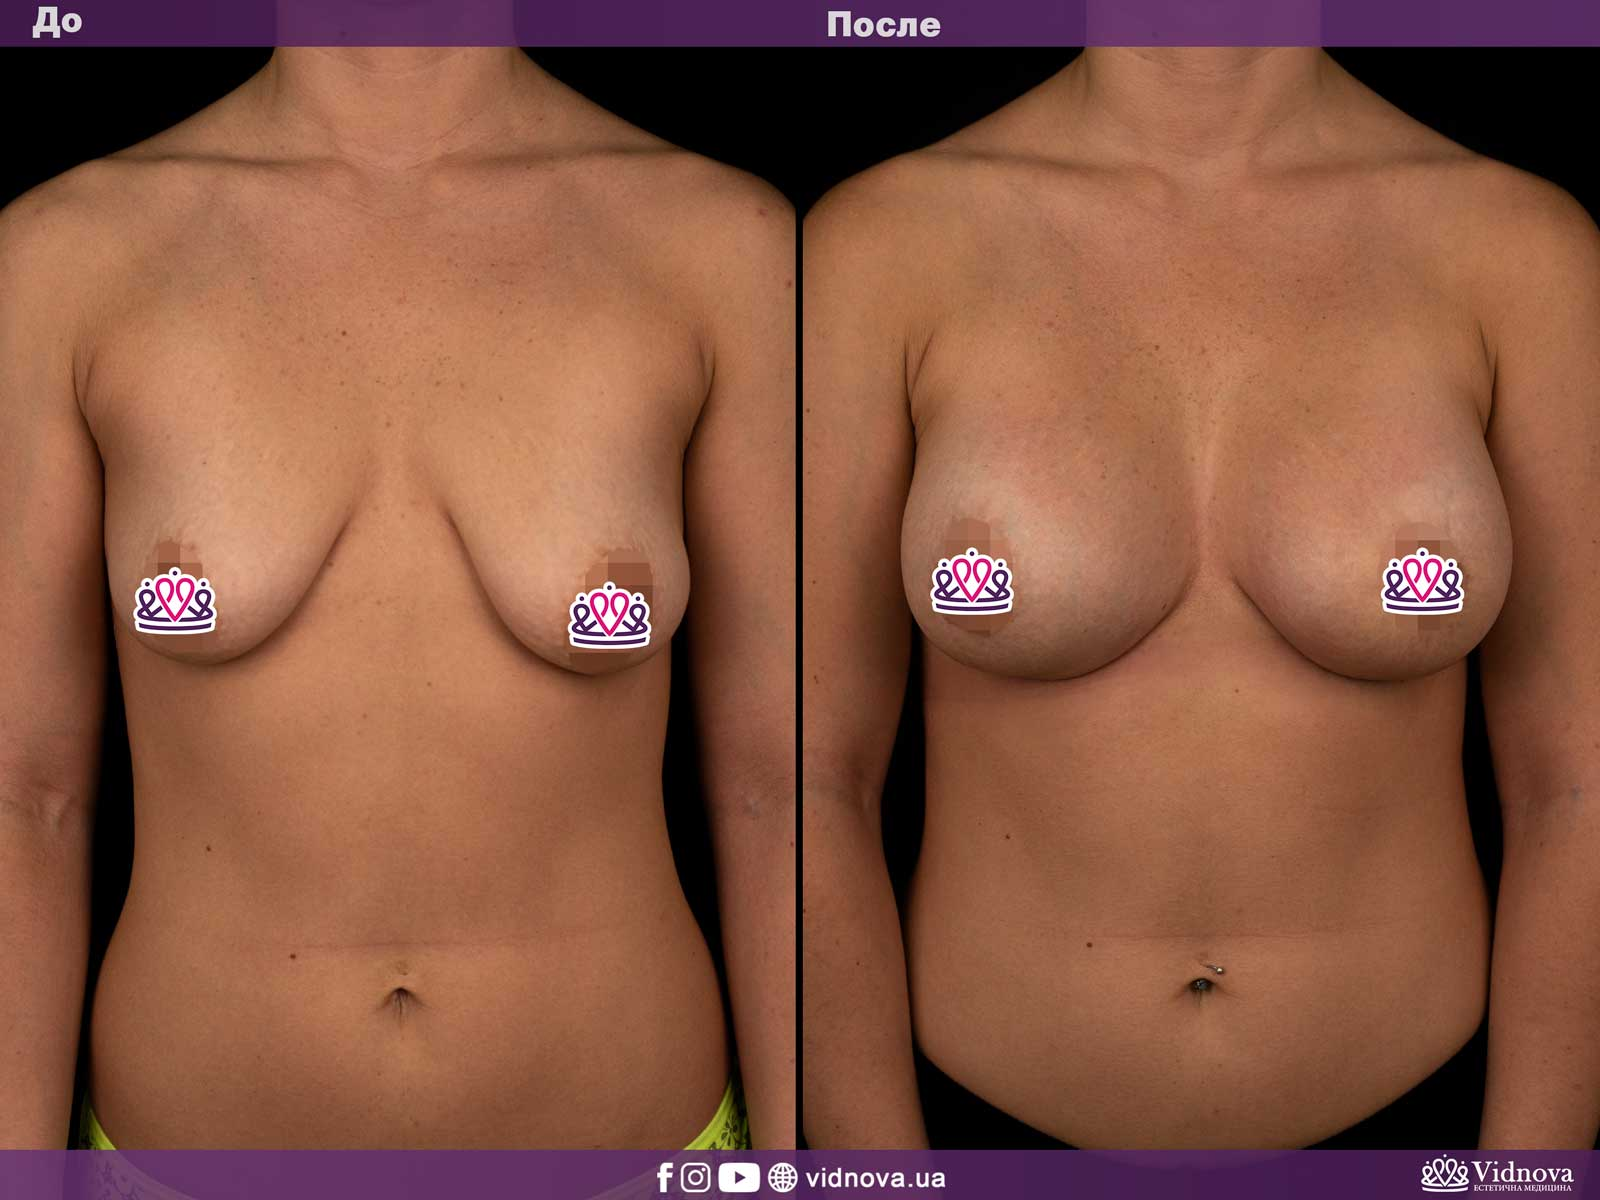 Подтяжка груди: Фото ДО и ПОСЛЕ - Пример №6-1 - Клиника Vidnova